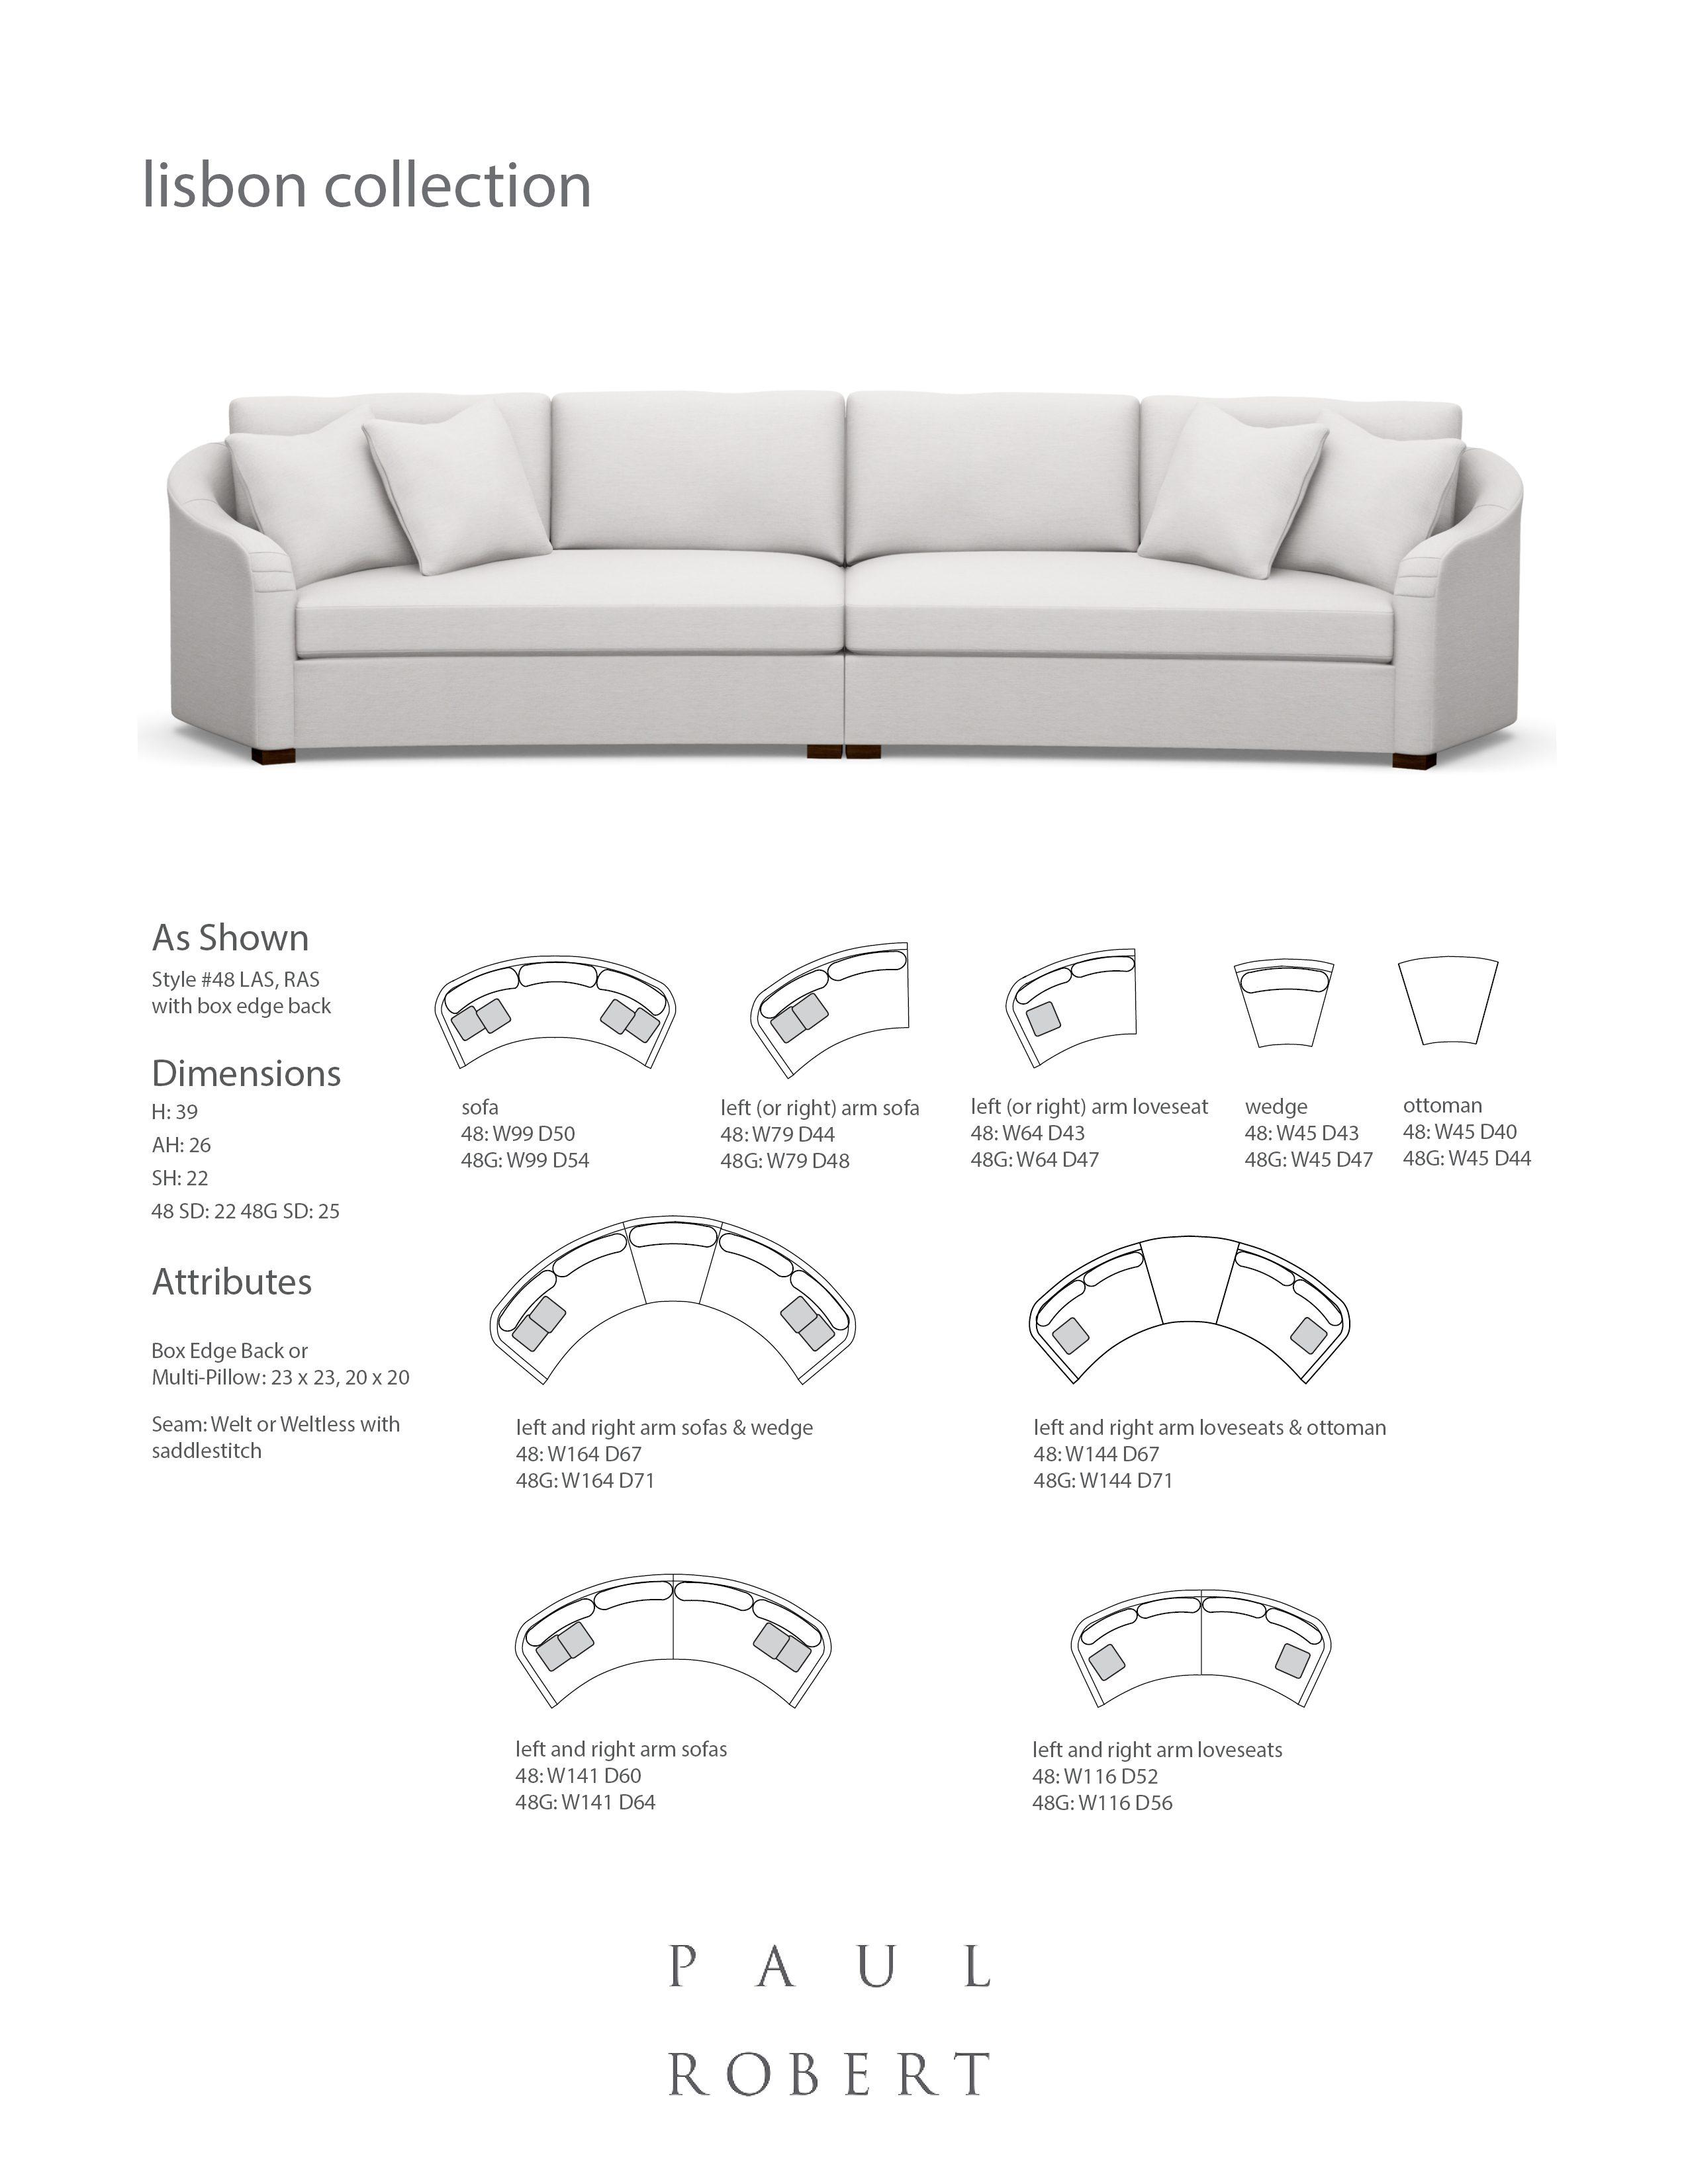 Brilliant 48 Lisbon Sofa Sectional Sofa Paul Robert Furniture Beatyapartments Chair Design Images Beatyapartmentscom